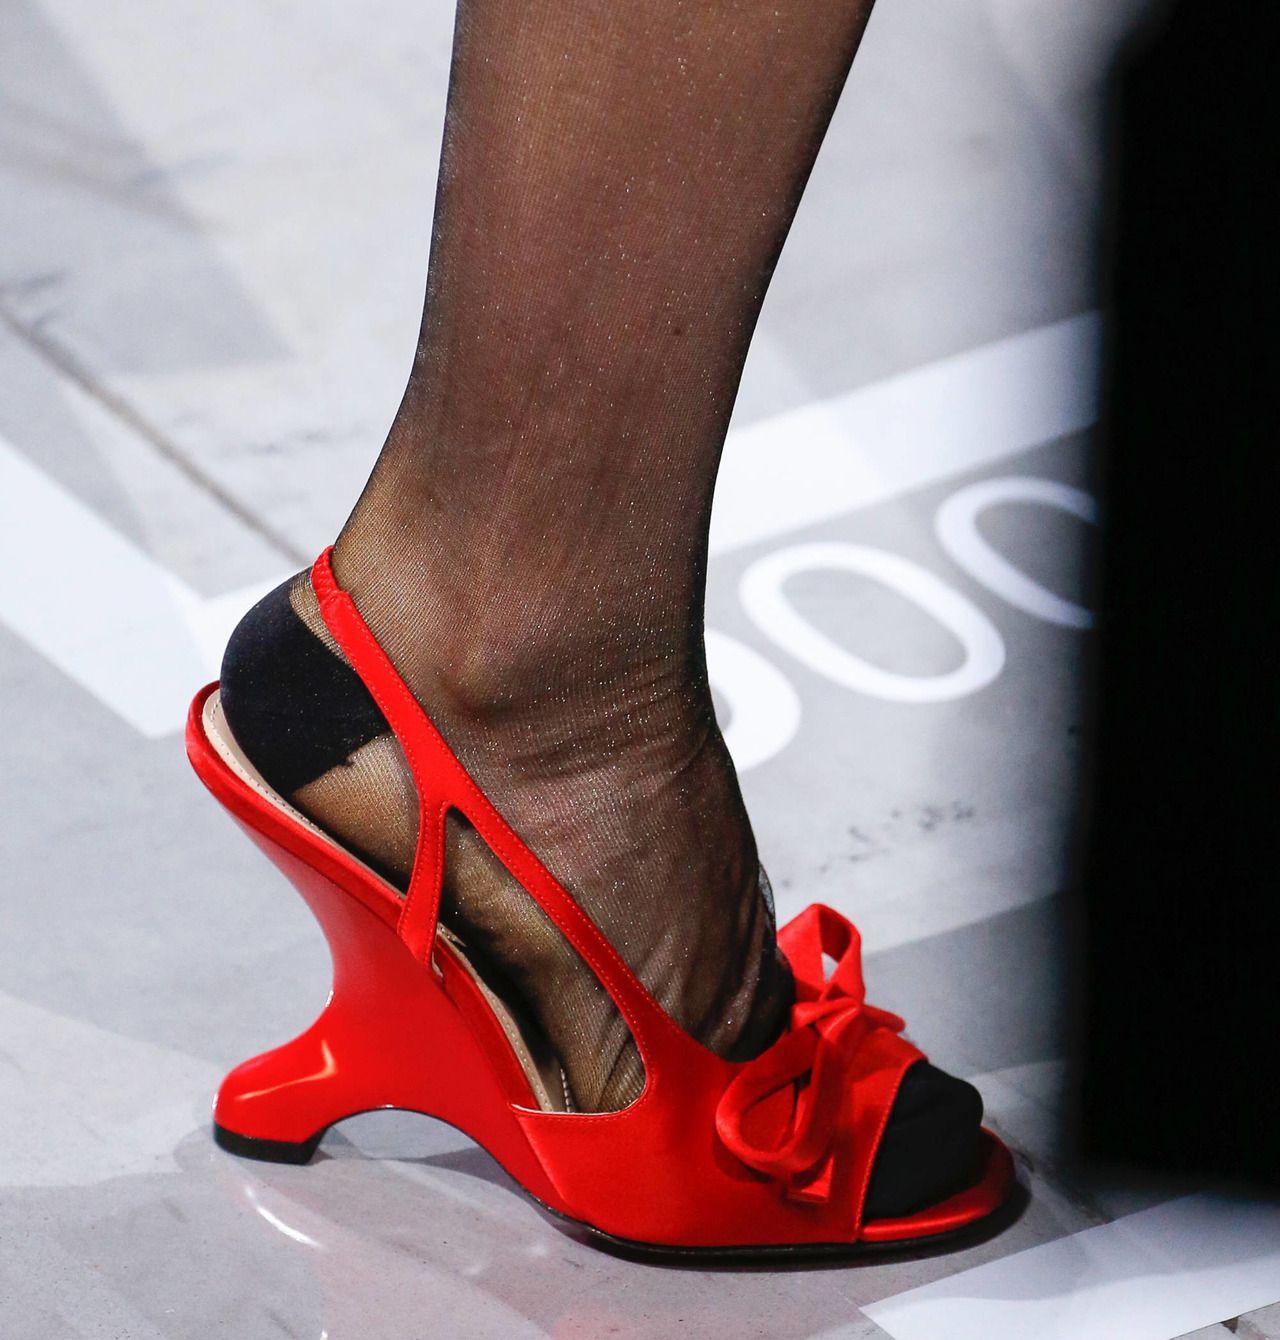 Pin on Shoes \u0026 Heels